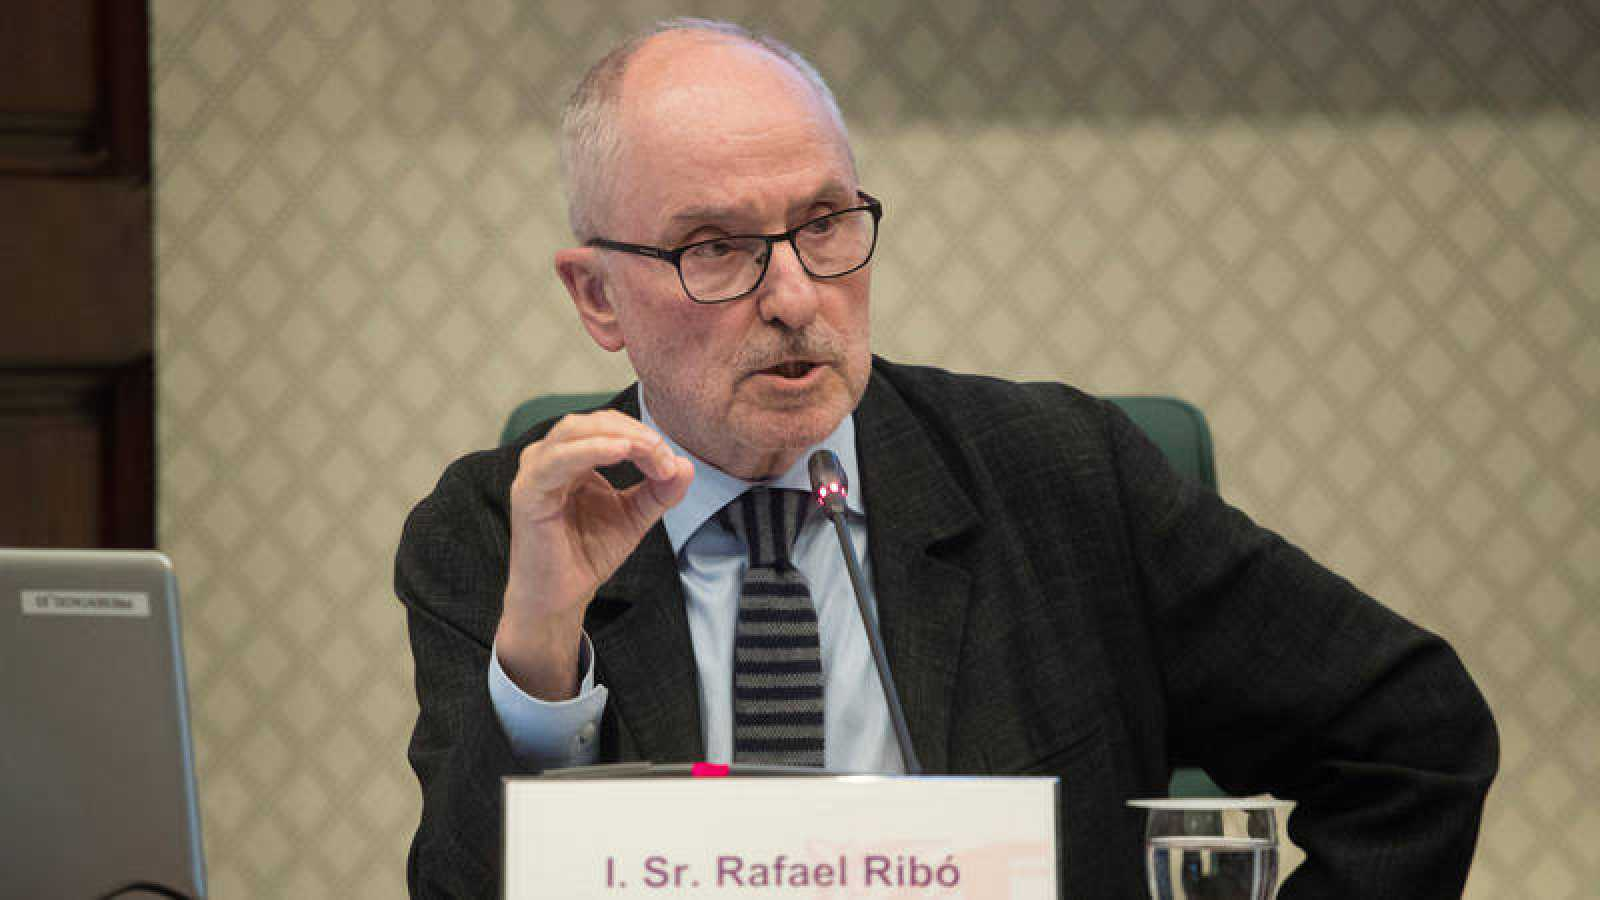 El Síndic de Greuges de Cataluña, Rafael Ribó